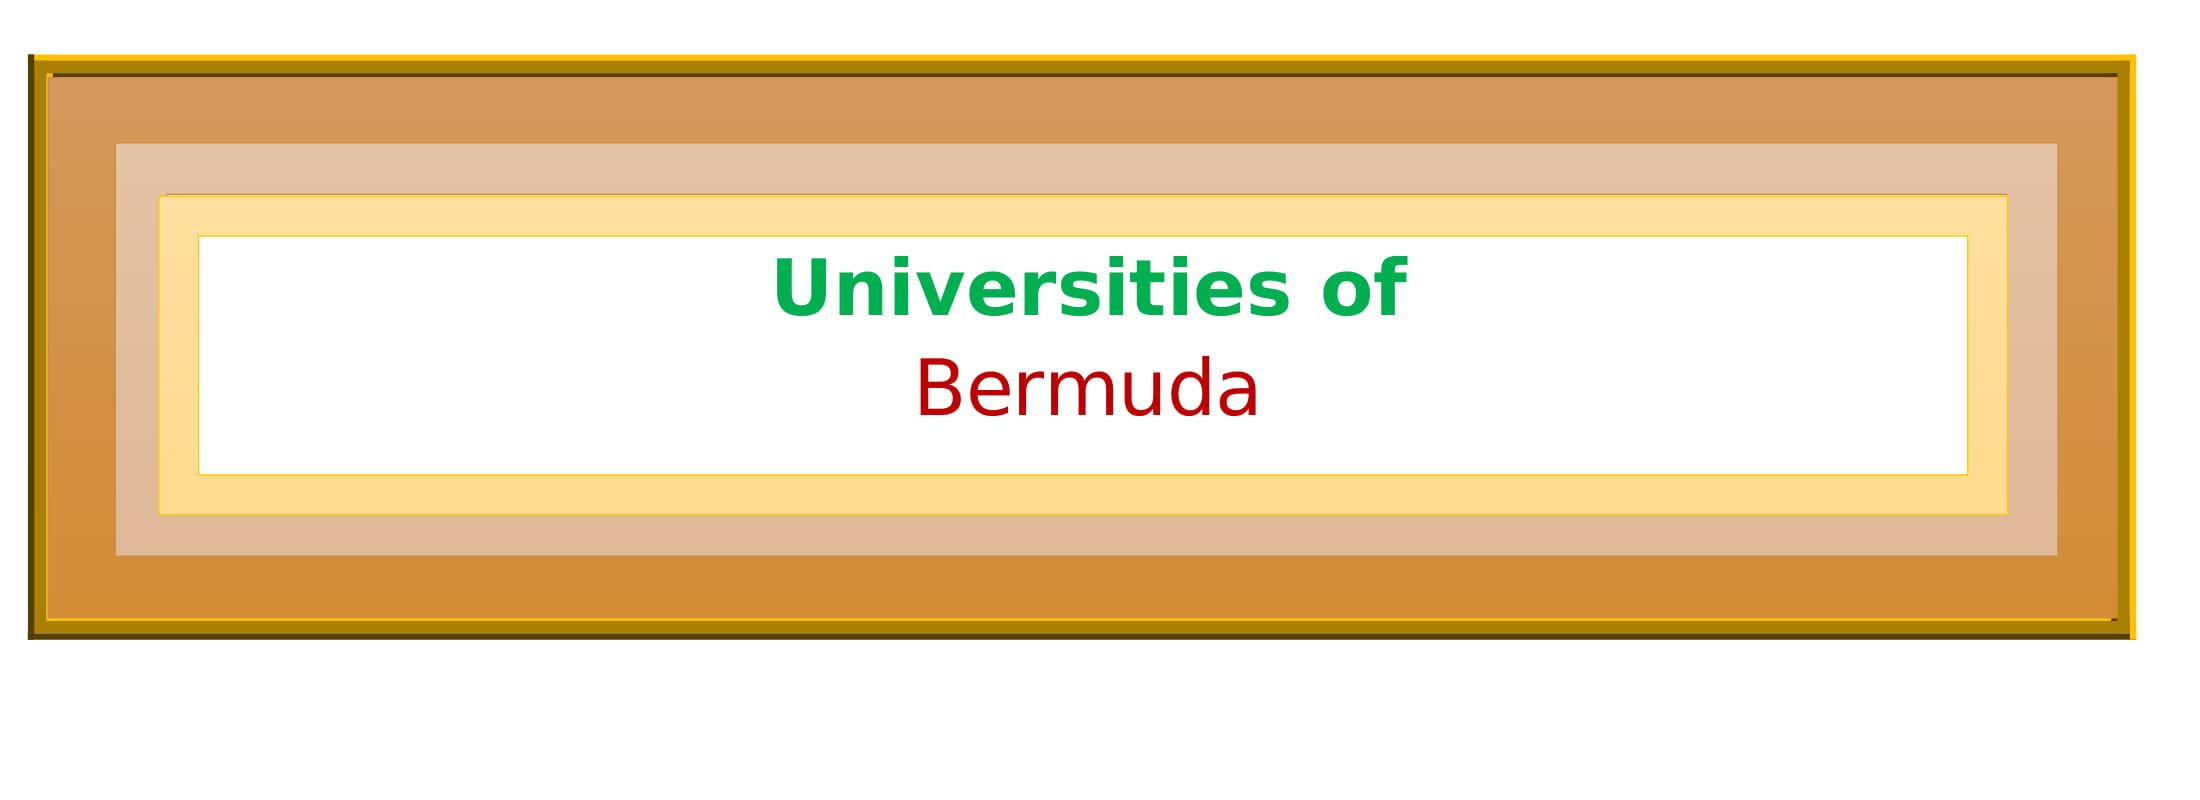 List of Universities in Bermuda